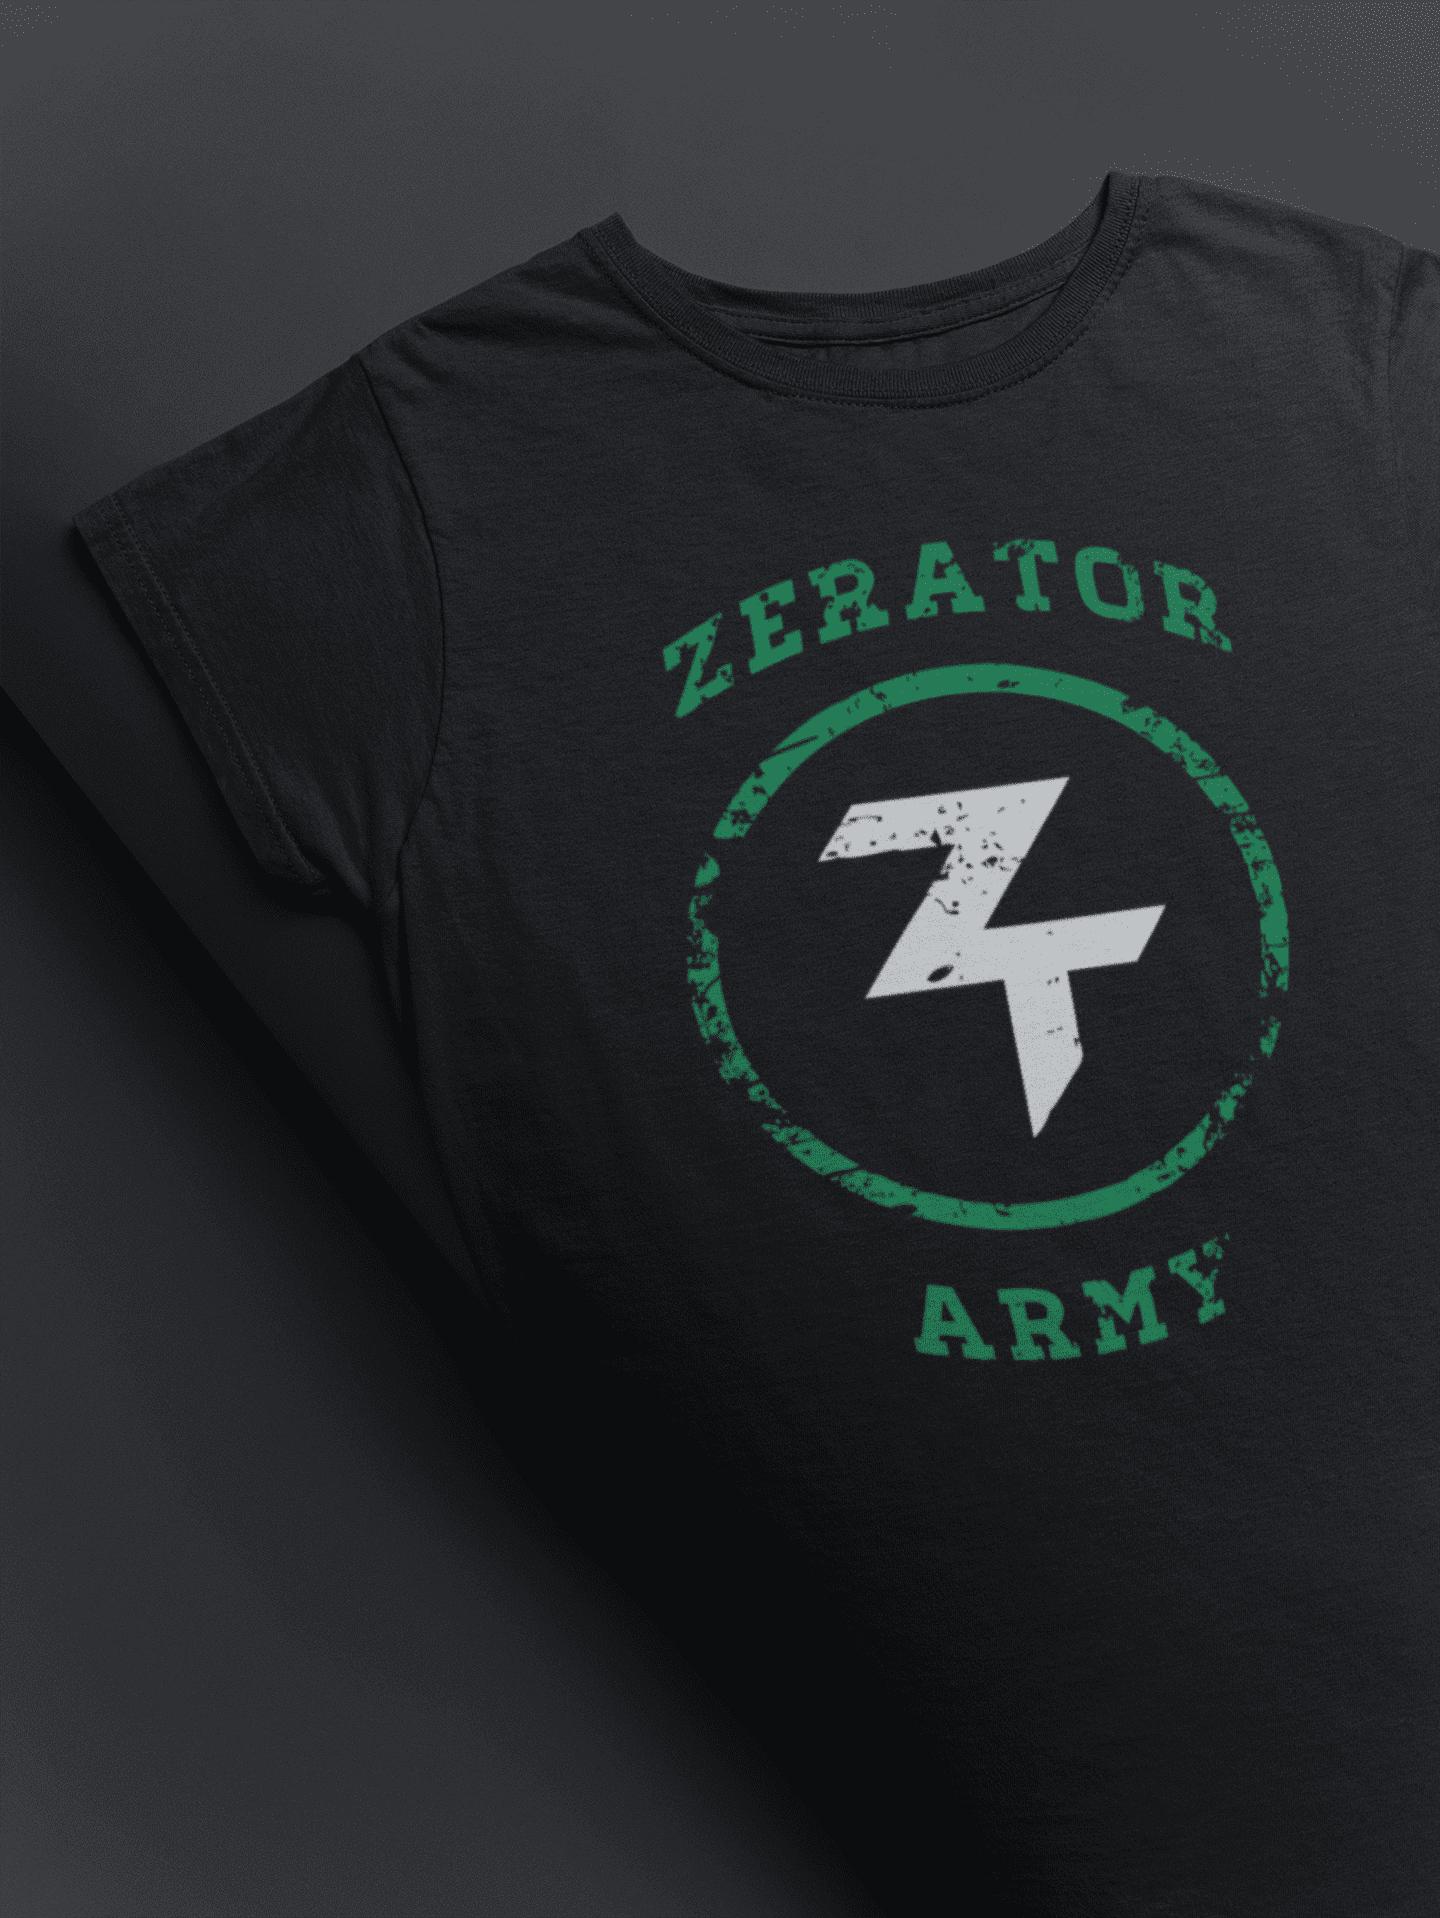 Tee-Shirt ZeratoR Army | Boutique ZeratoR